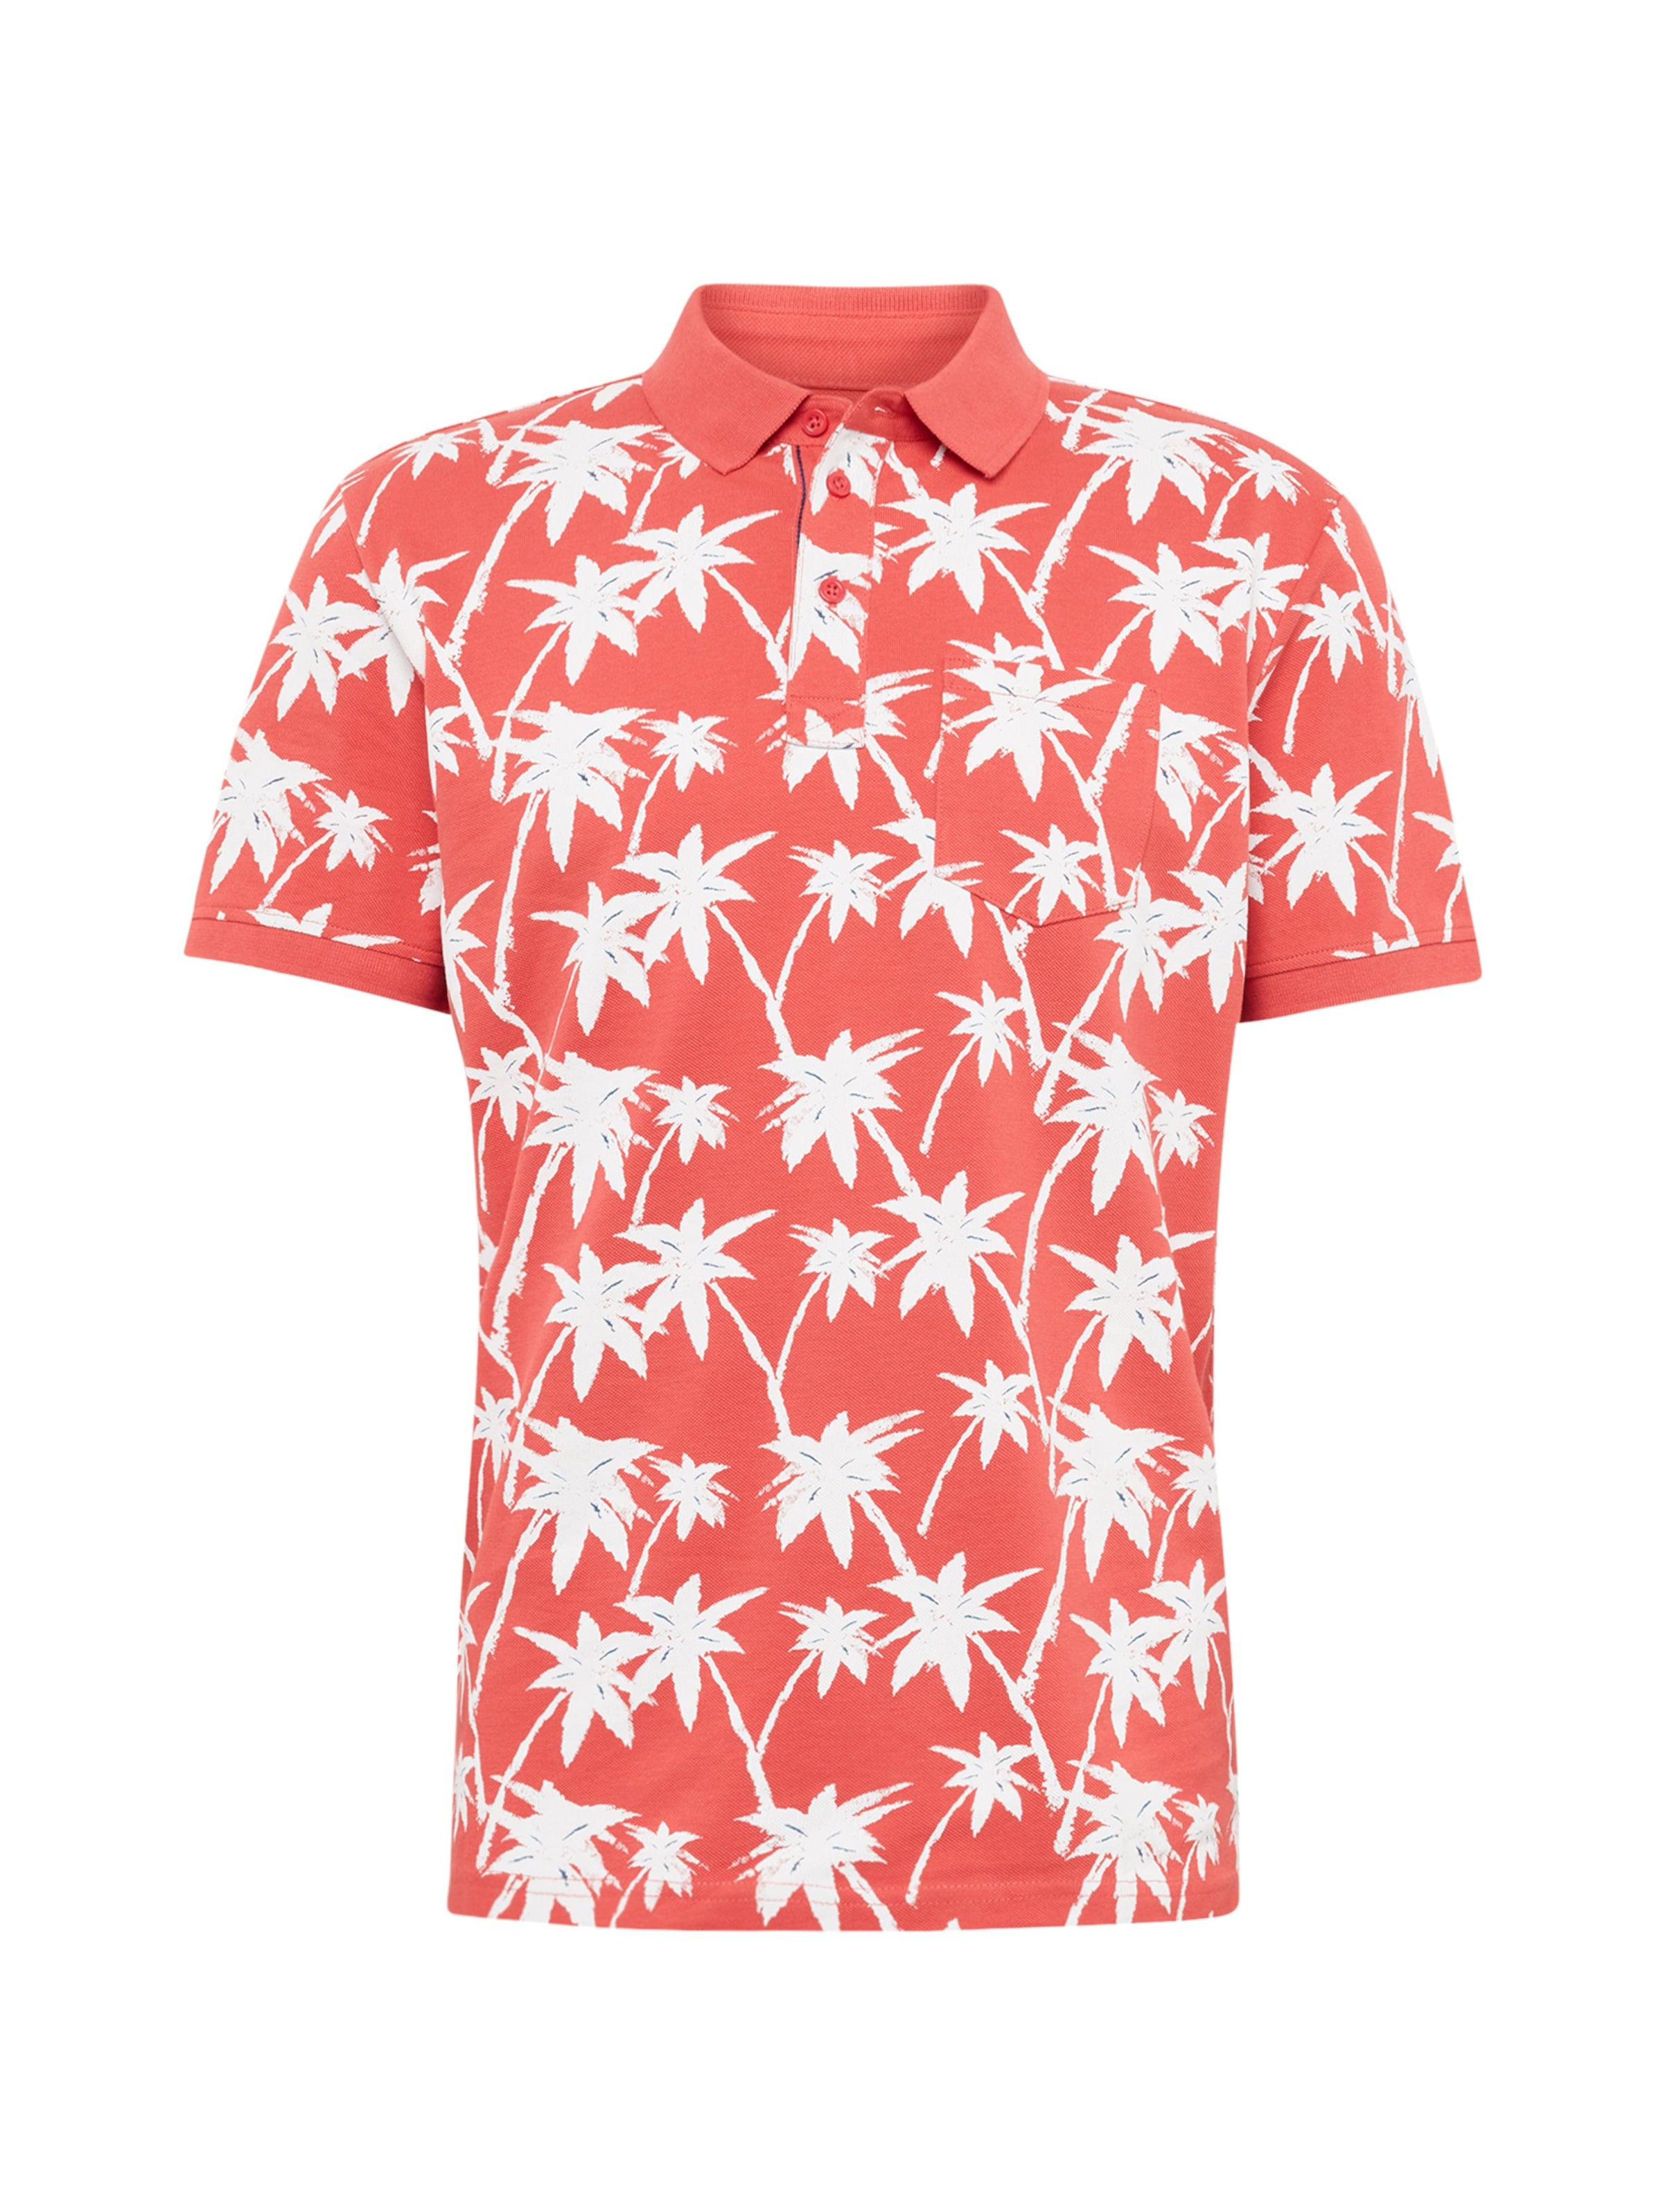 Tom In In Tailor Poloshirt Poloshirt Tailor Tom MeloneWeiß MeloneWeiß ZXuiOPk